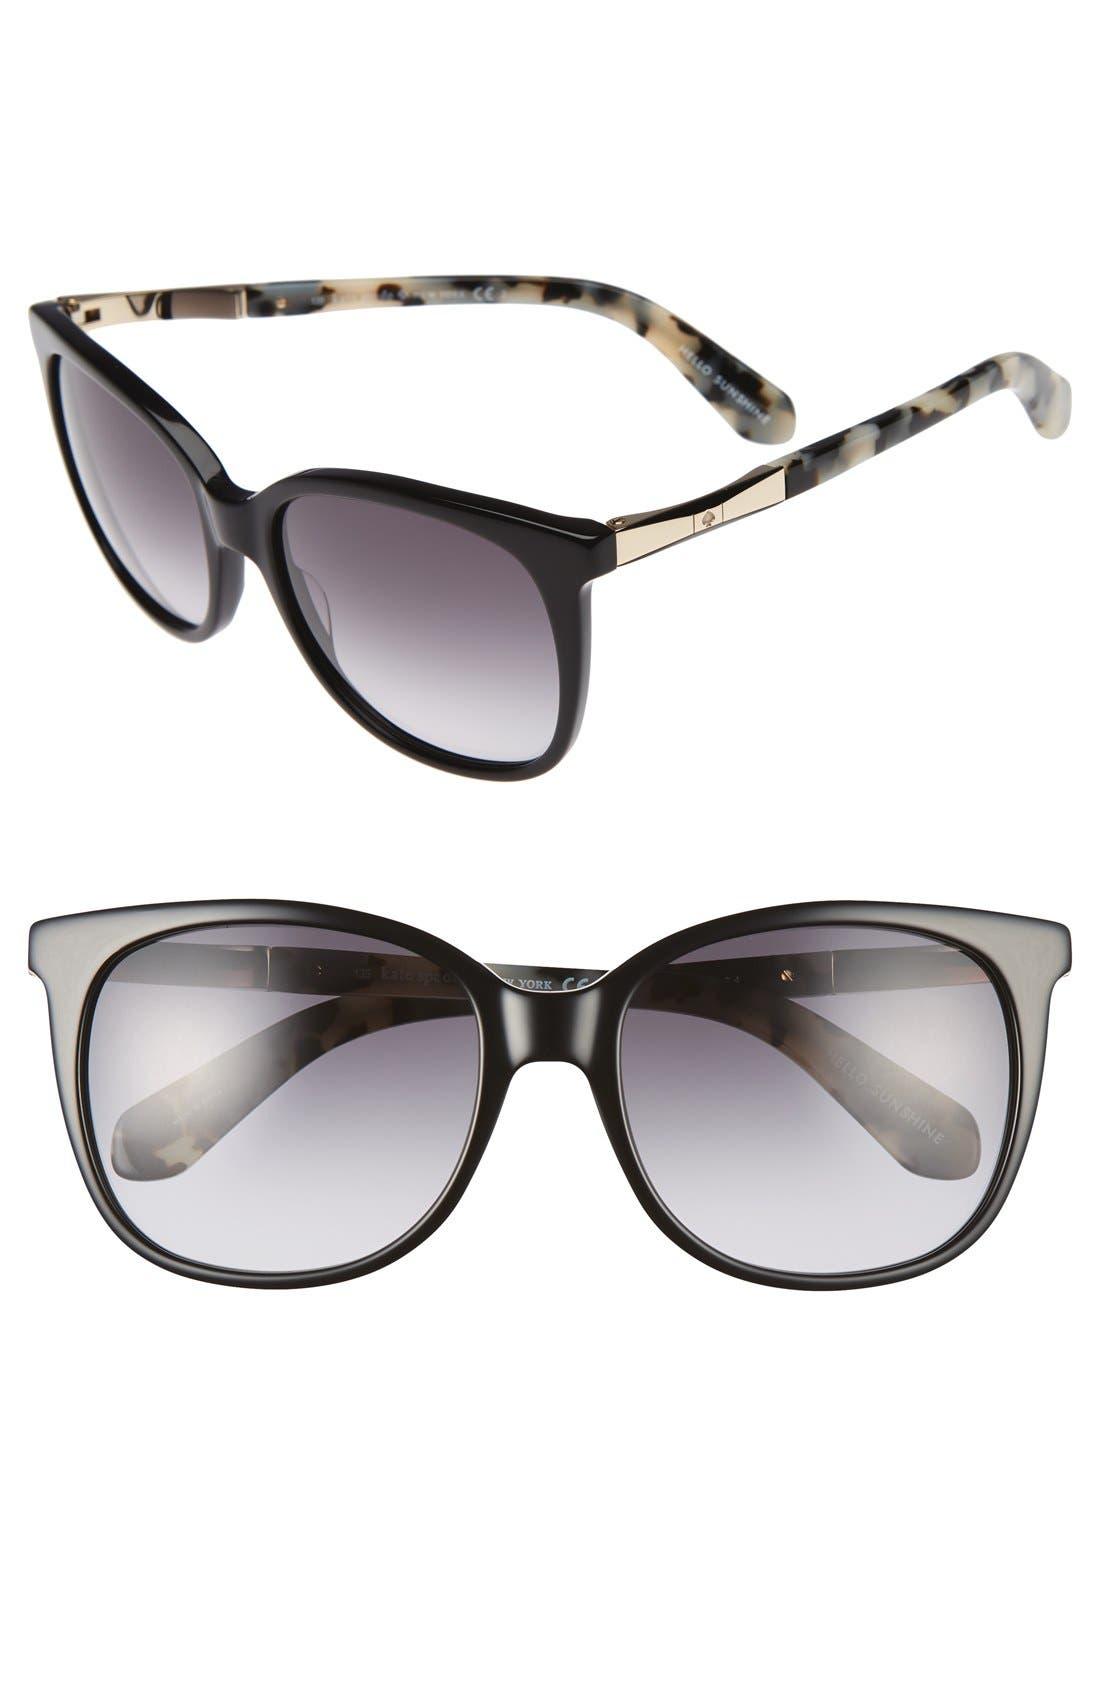 Main Image - kate spade new york julieanna 54mm sunglasses